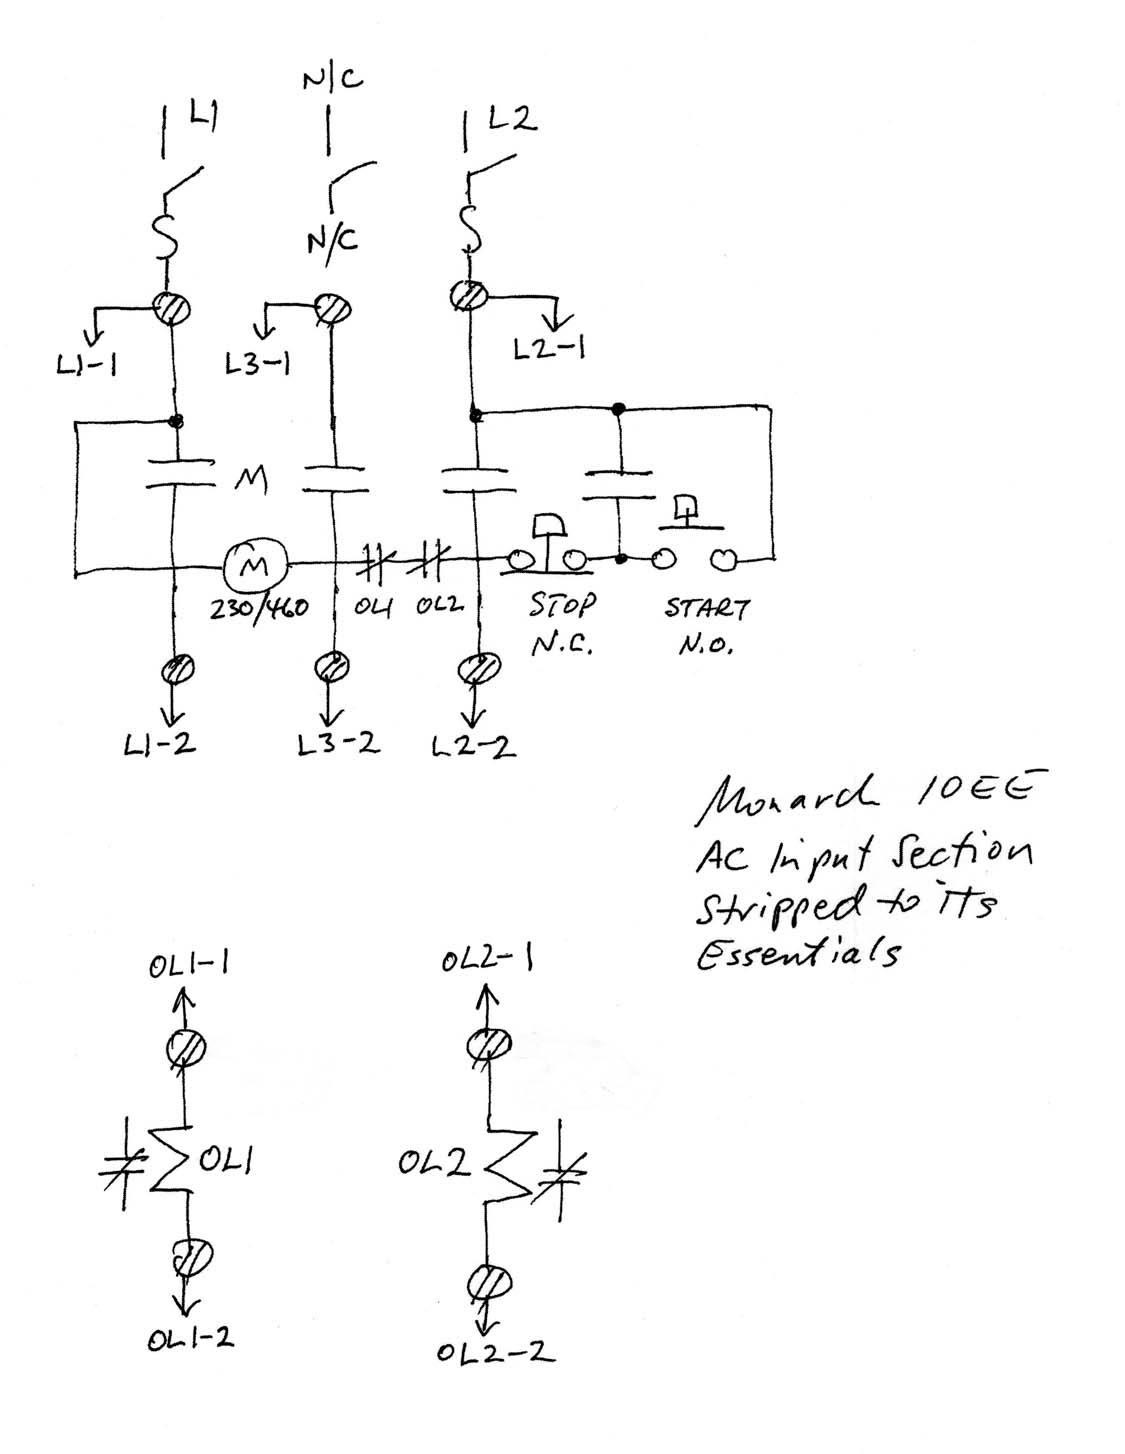 Diagram Baldor Single Phase Generator Wiring Diagram Full Version Hd Quality Wiring Diagram Mydiagramx18 Osteriadamariano It